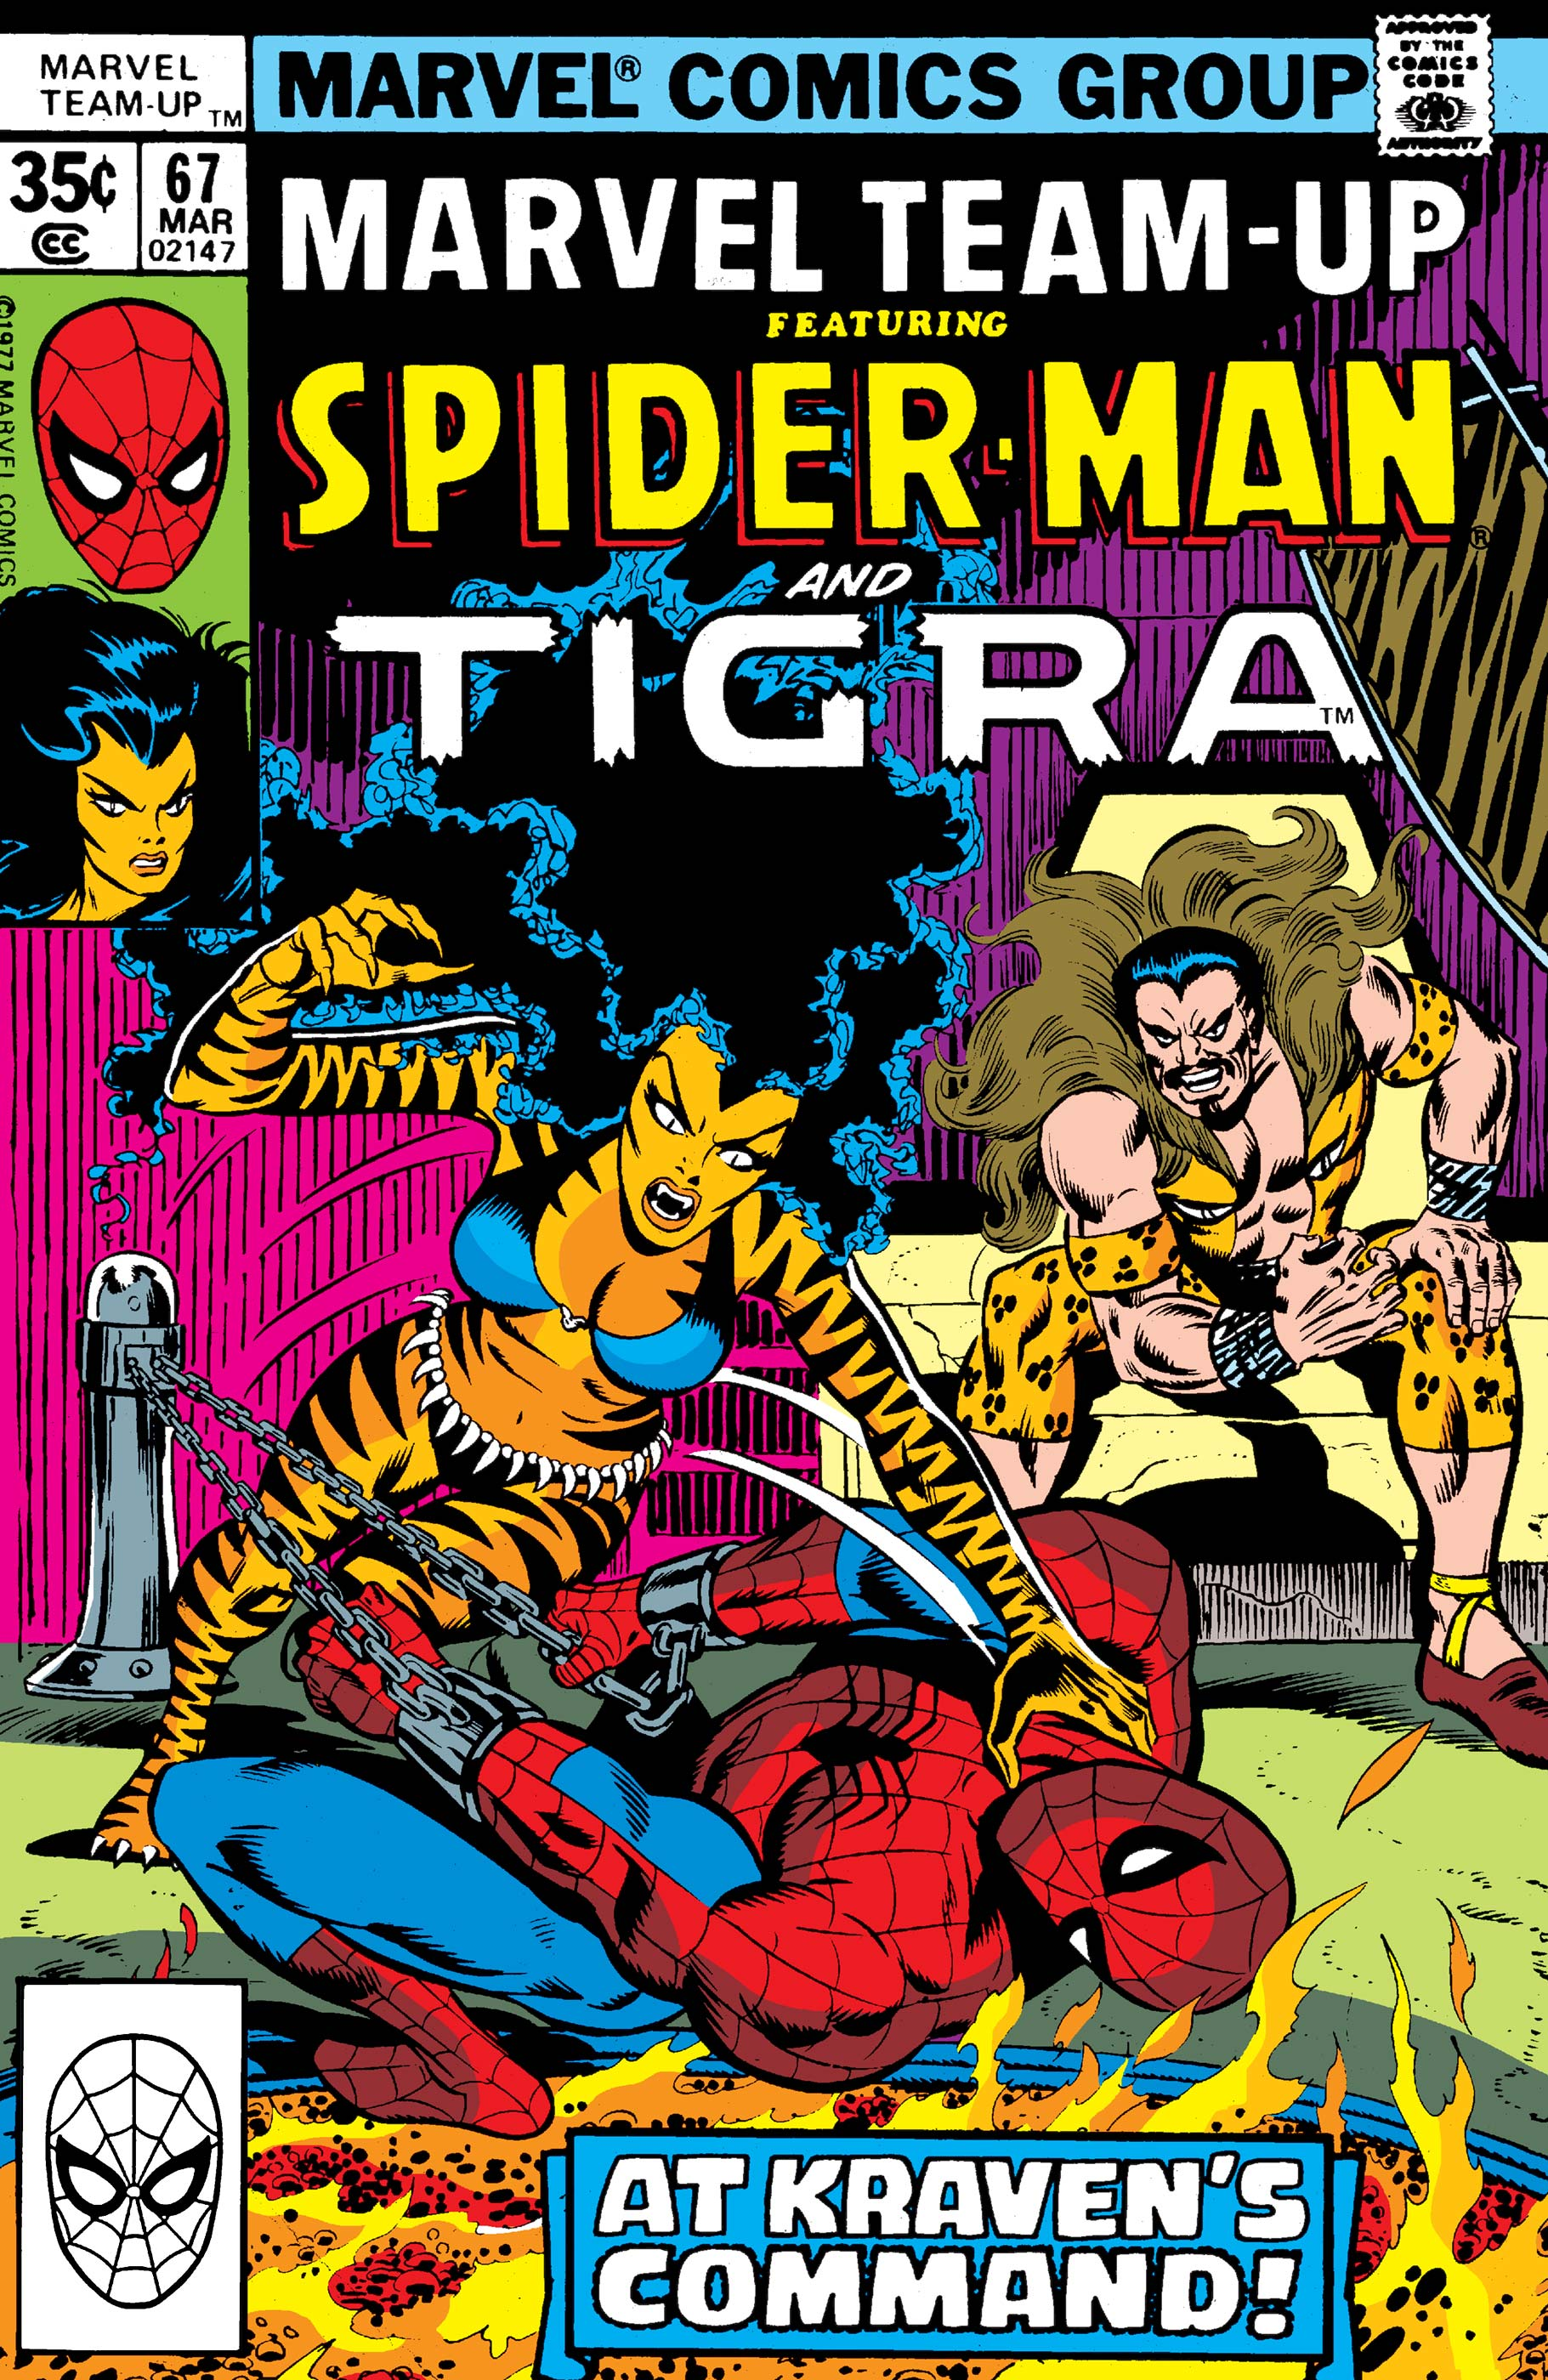 Marvel Team-Up (1972) #67